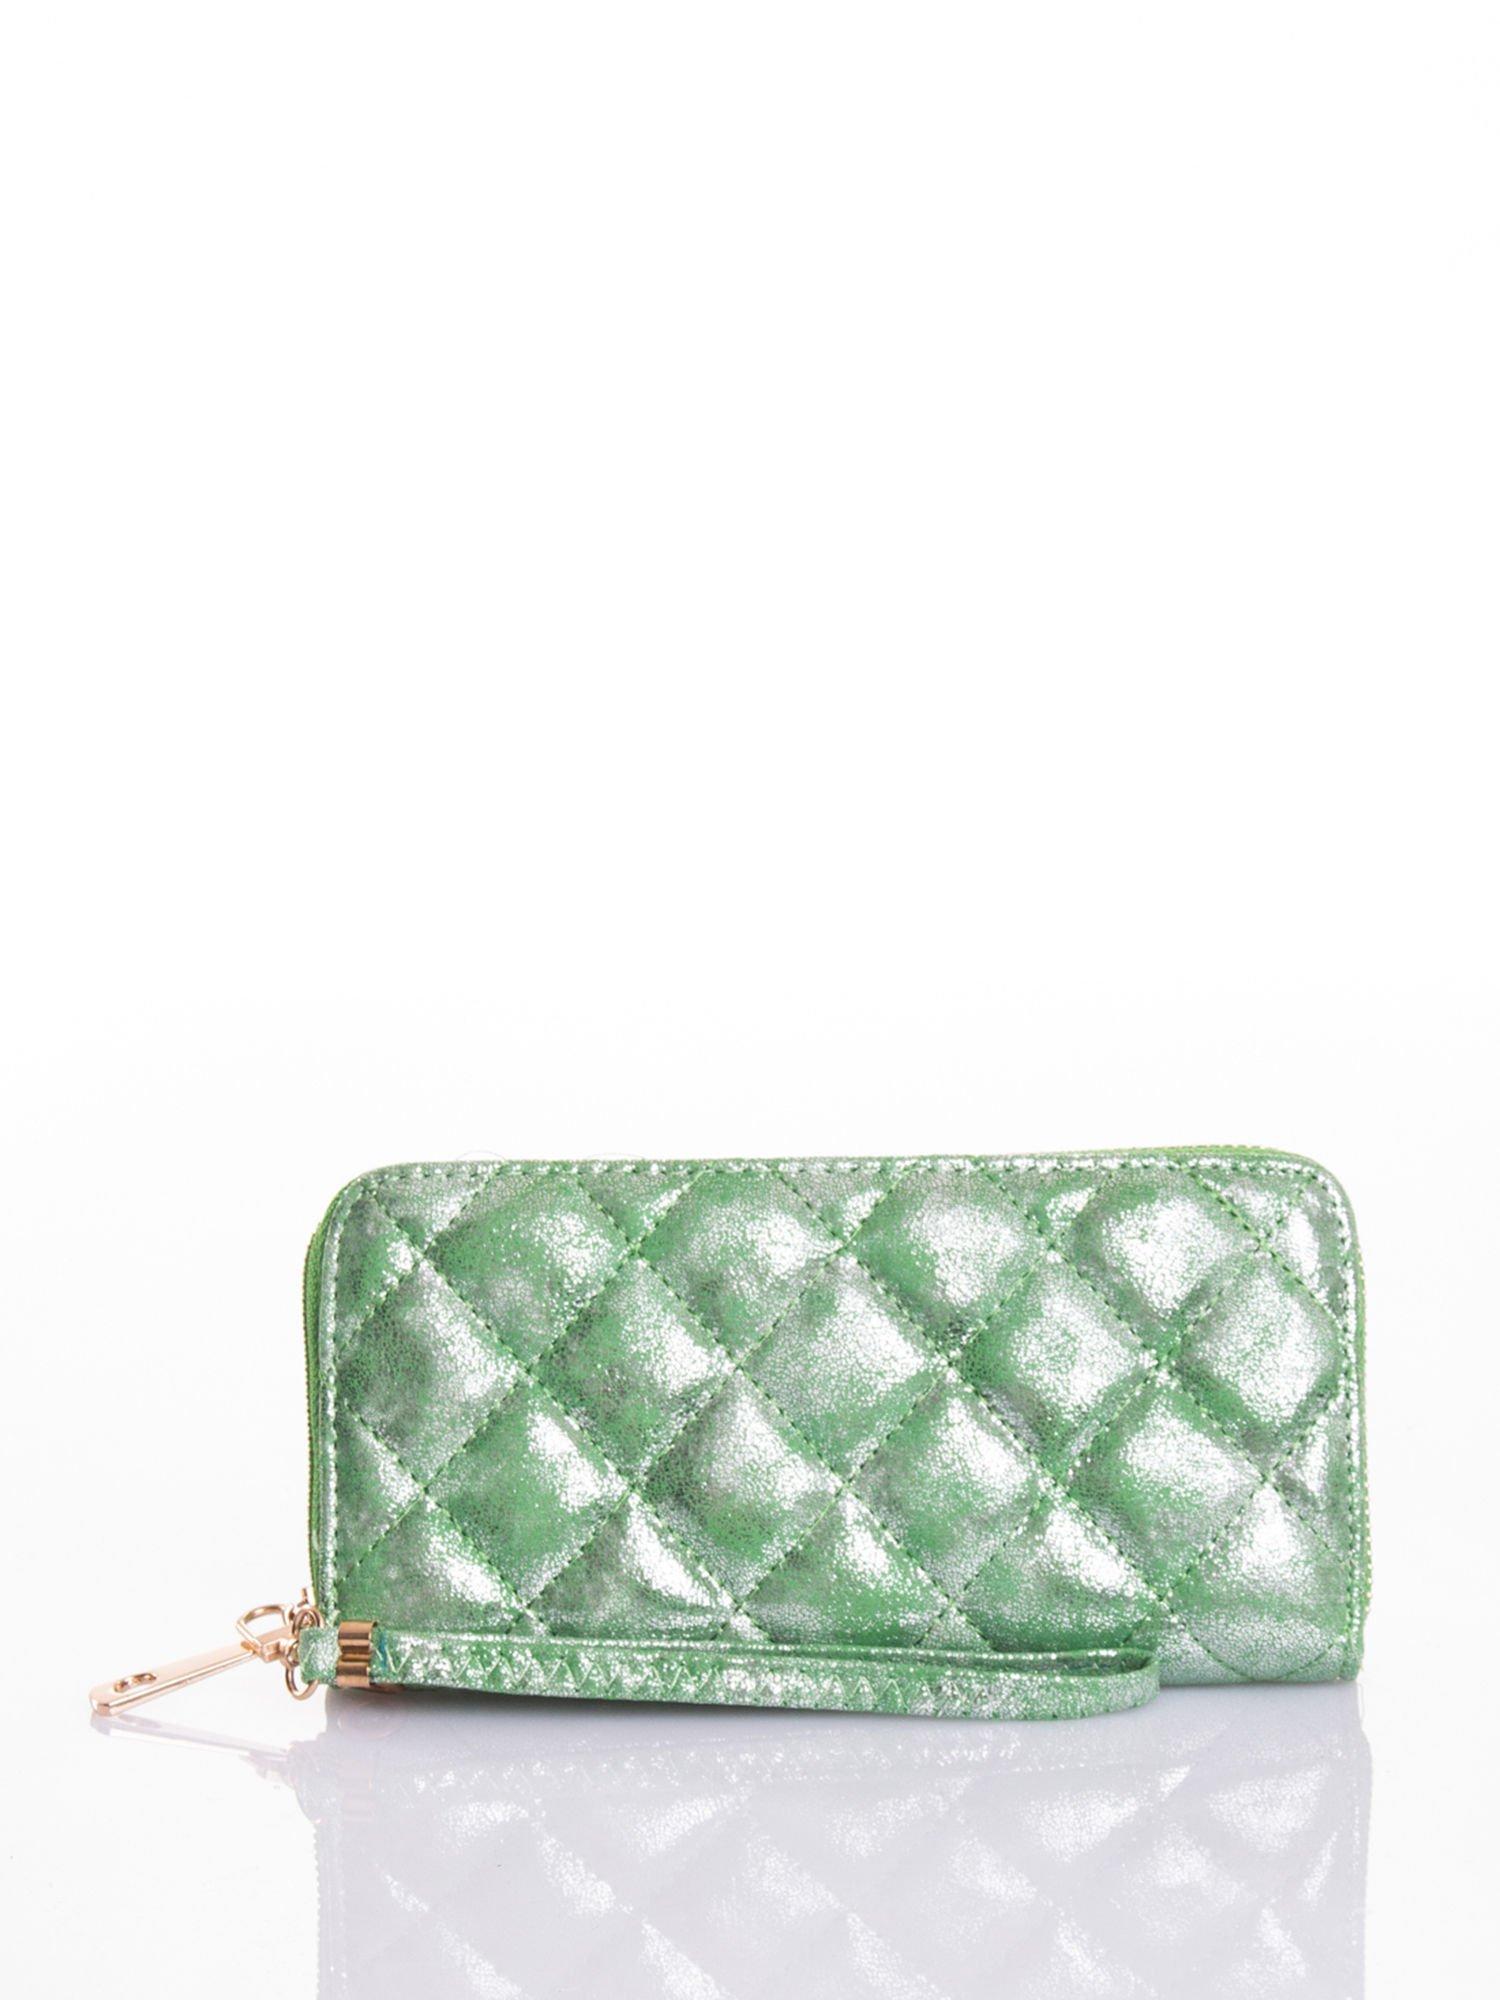 Zielony pikowany portfel                                  zdj.                                  4